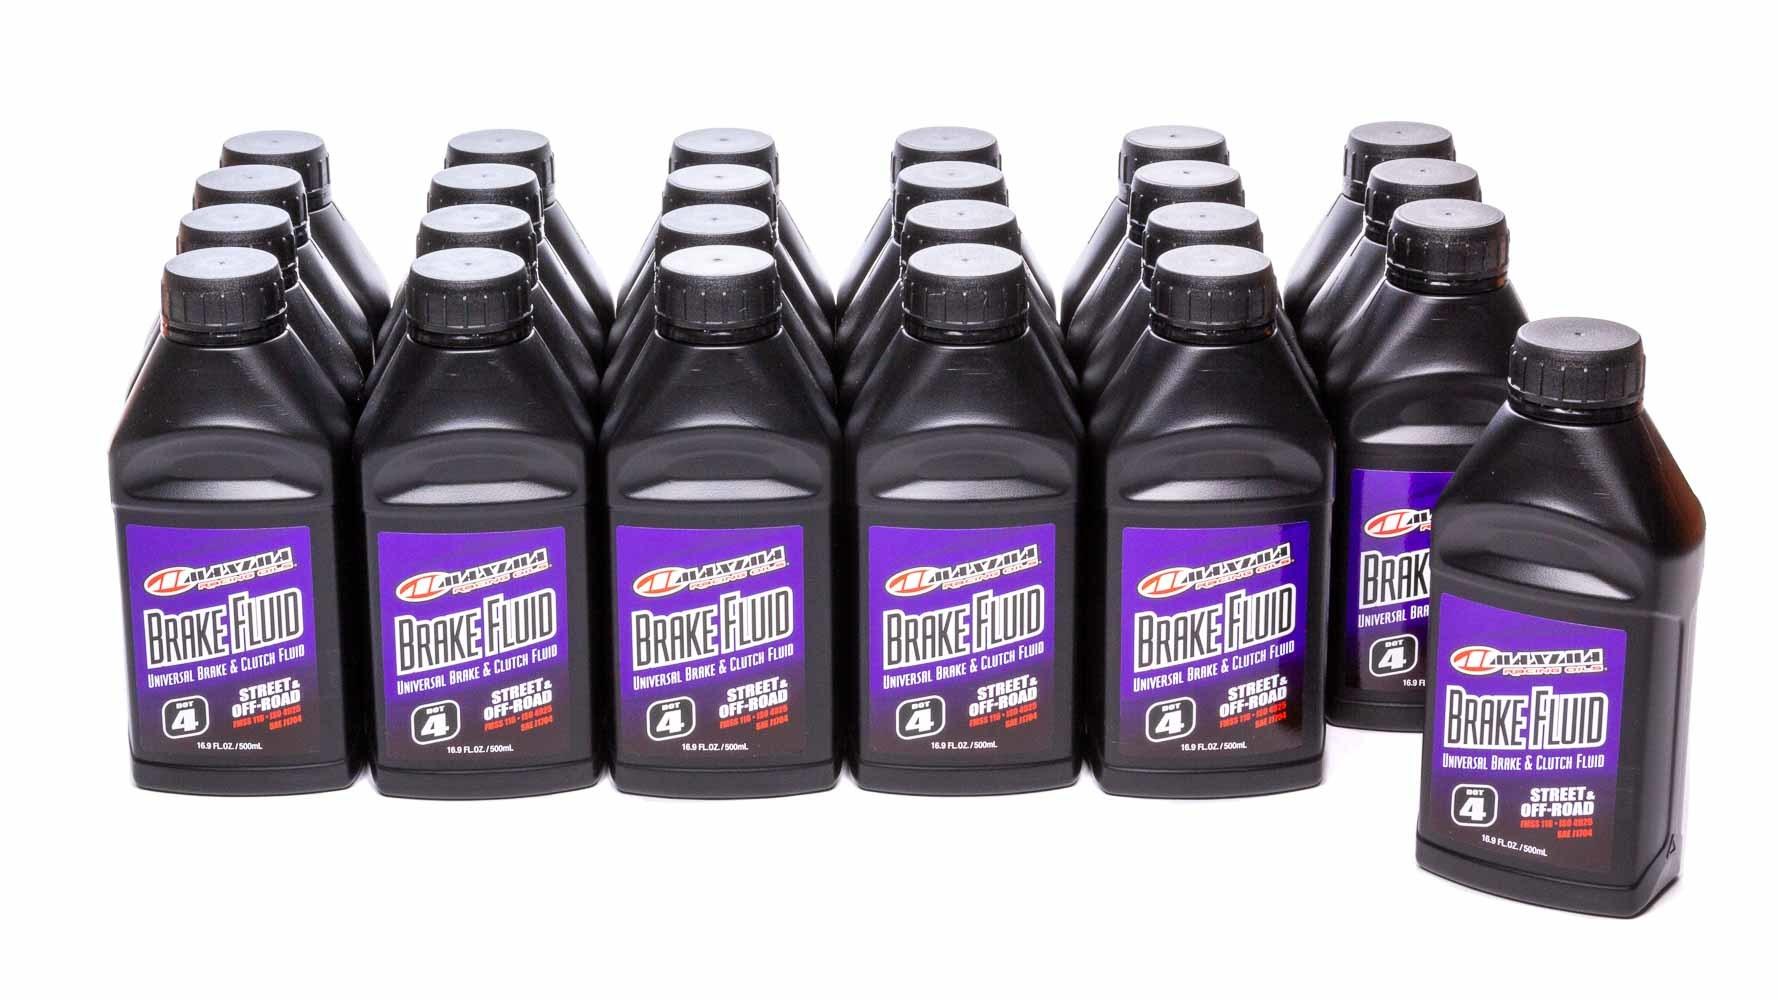 Brake Fluid Dot 4 Case 24 x 16.9oz. Bottle